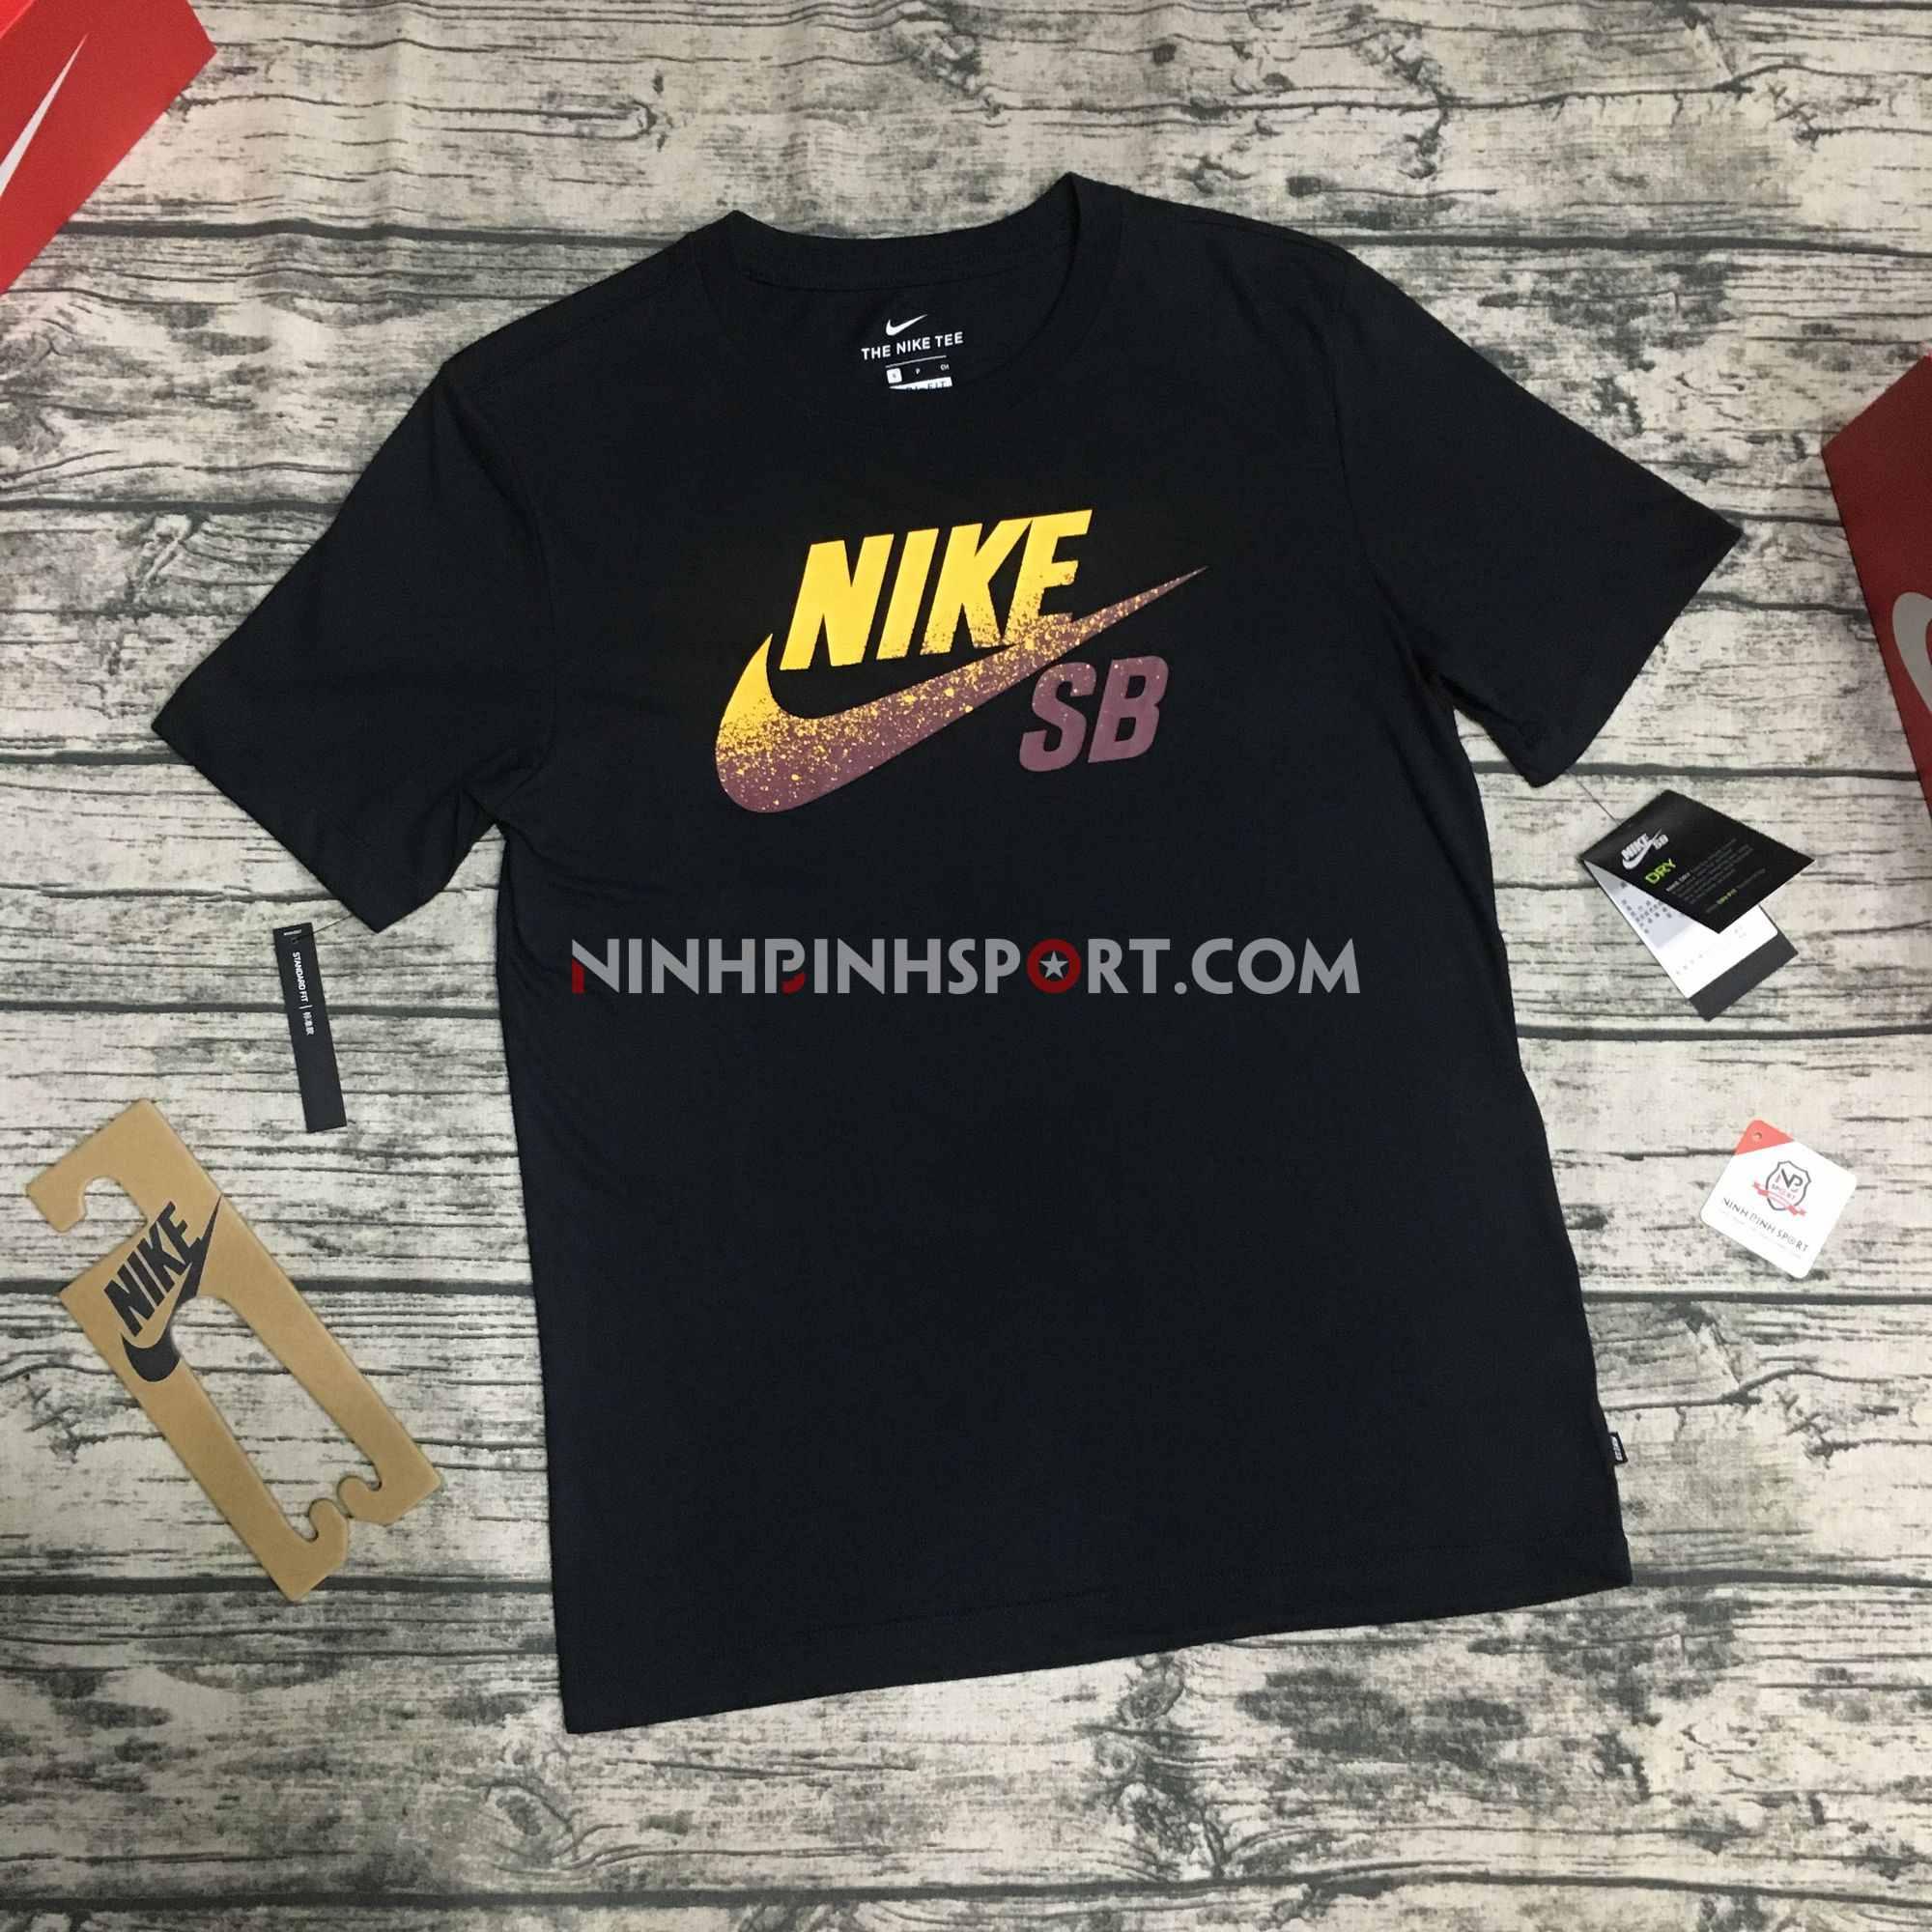 Áo thể thao nam Nike SB Dri-FIT Logo Skate Black BV7434-011